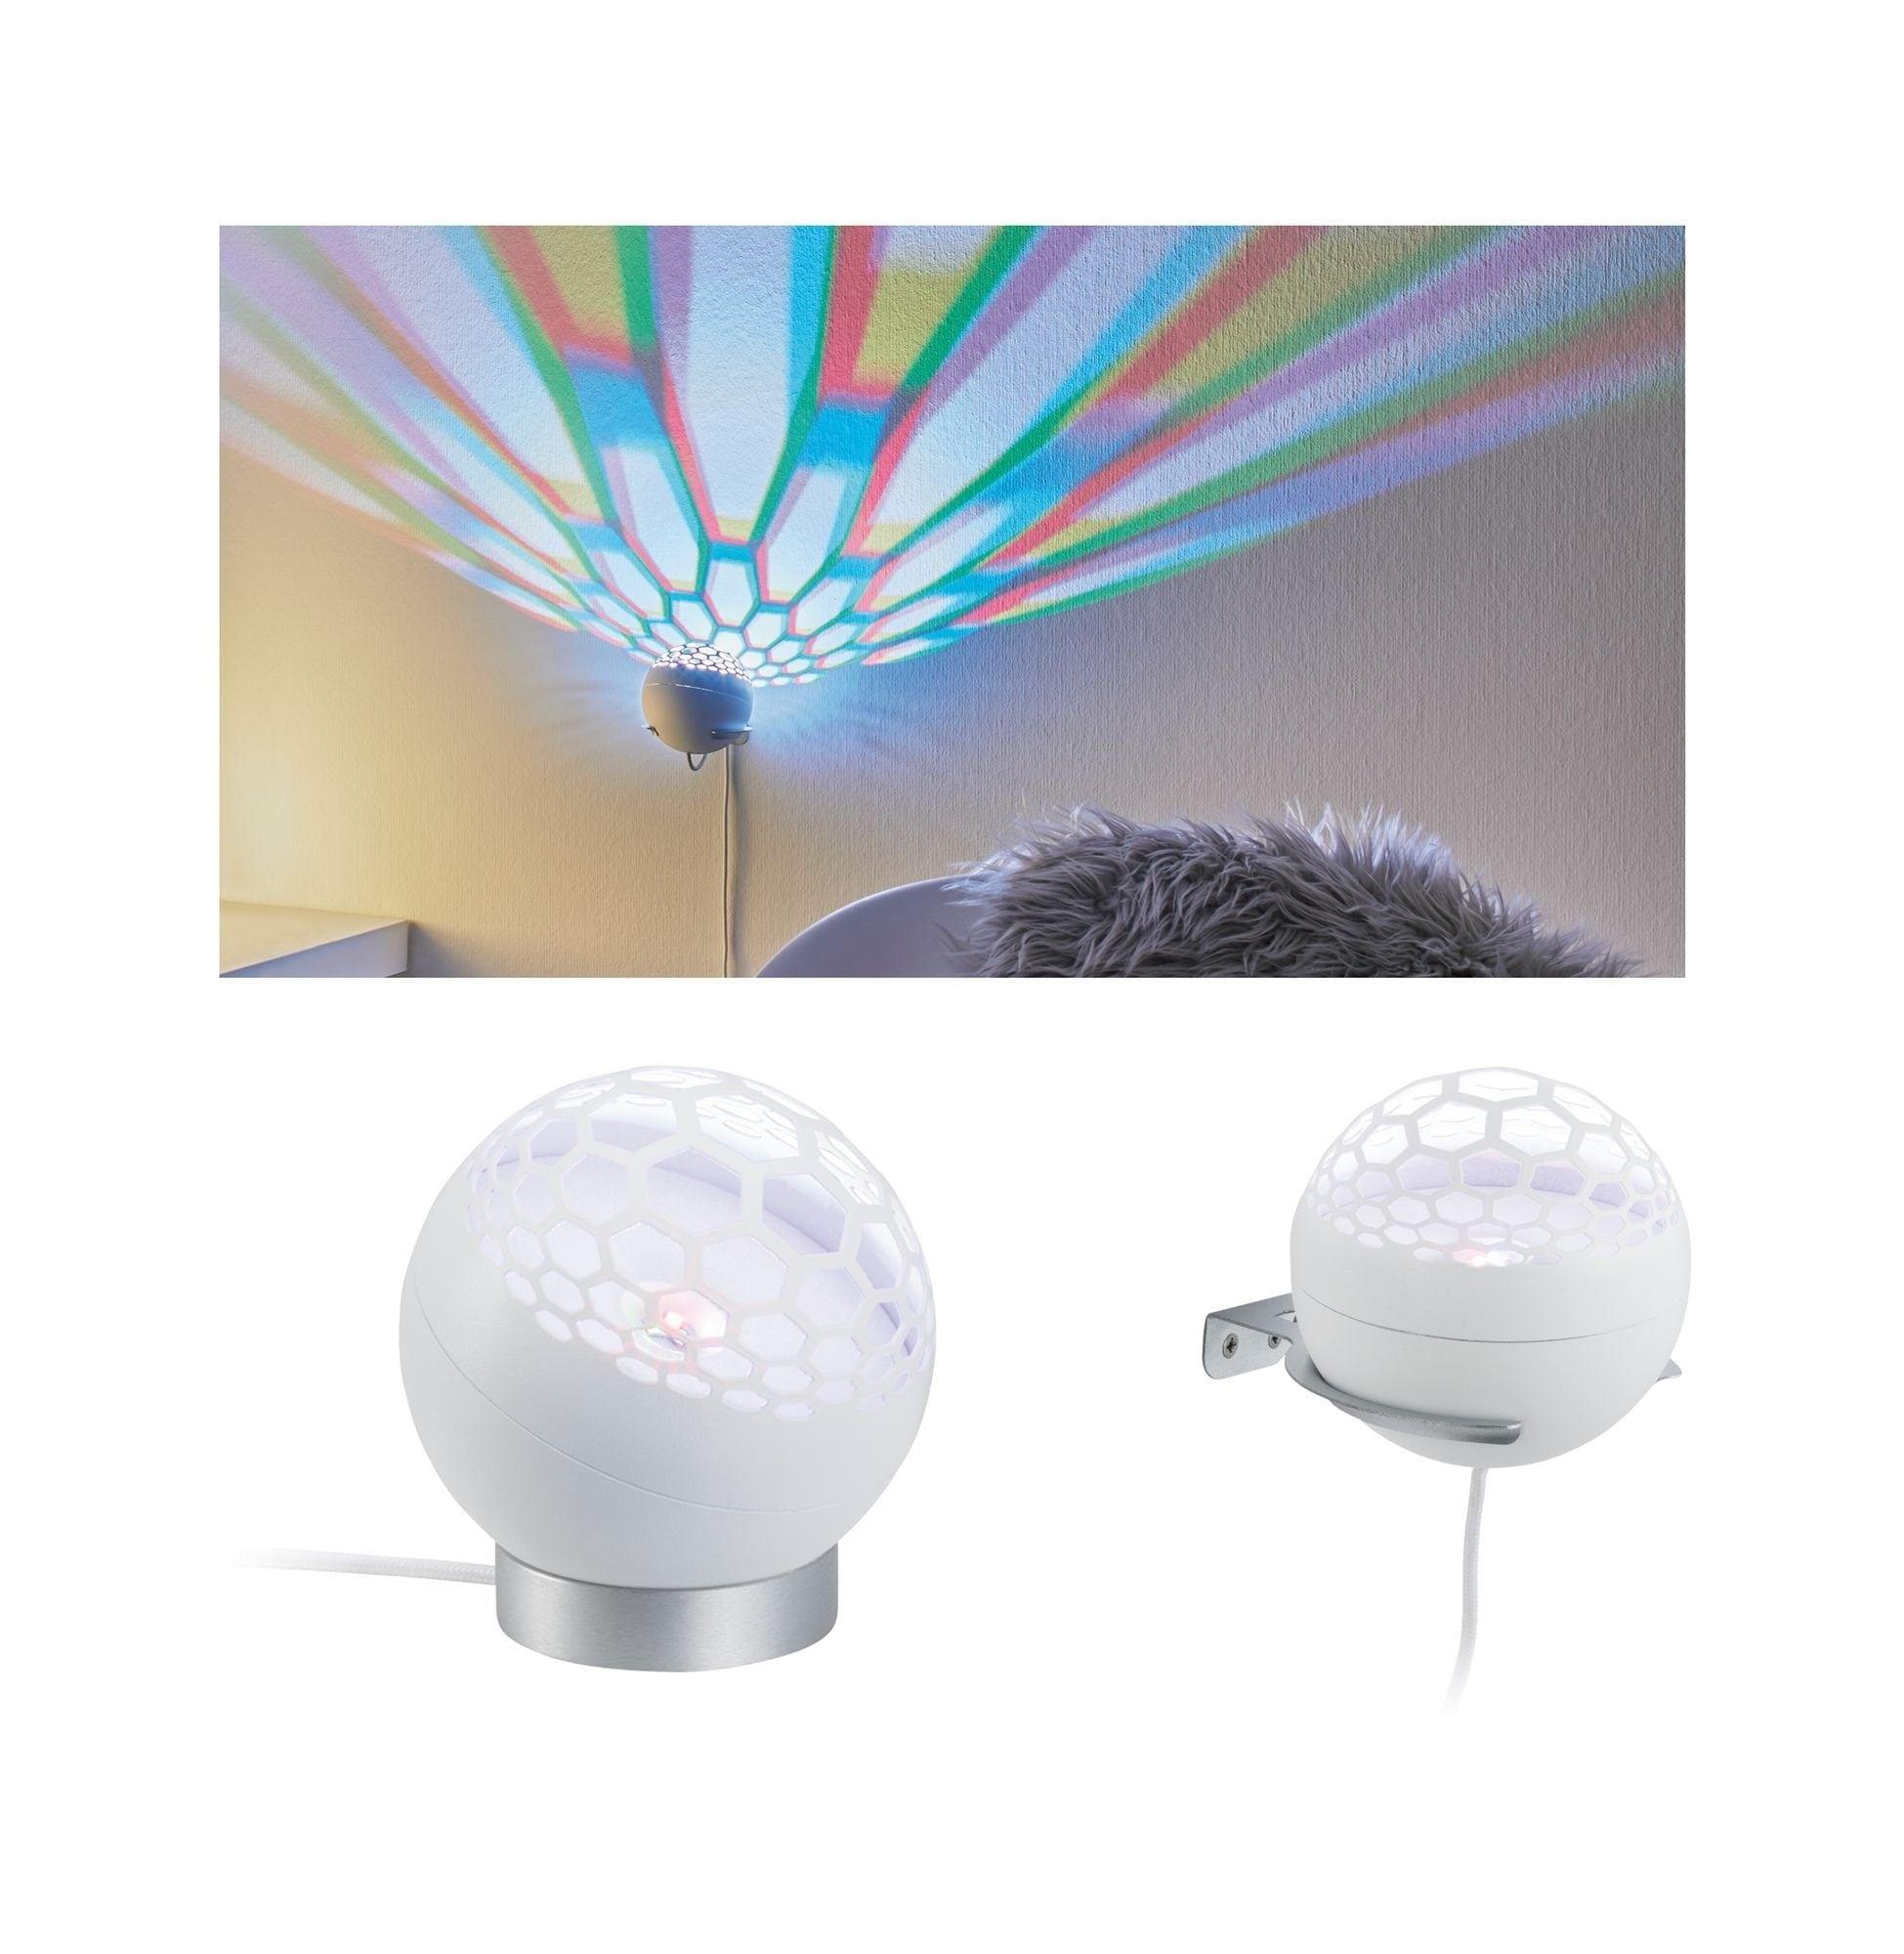 Paulmann,LED Tischleuchte Wandleuchte Favia RGB 6W Weiß